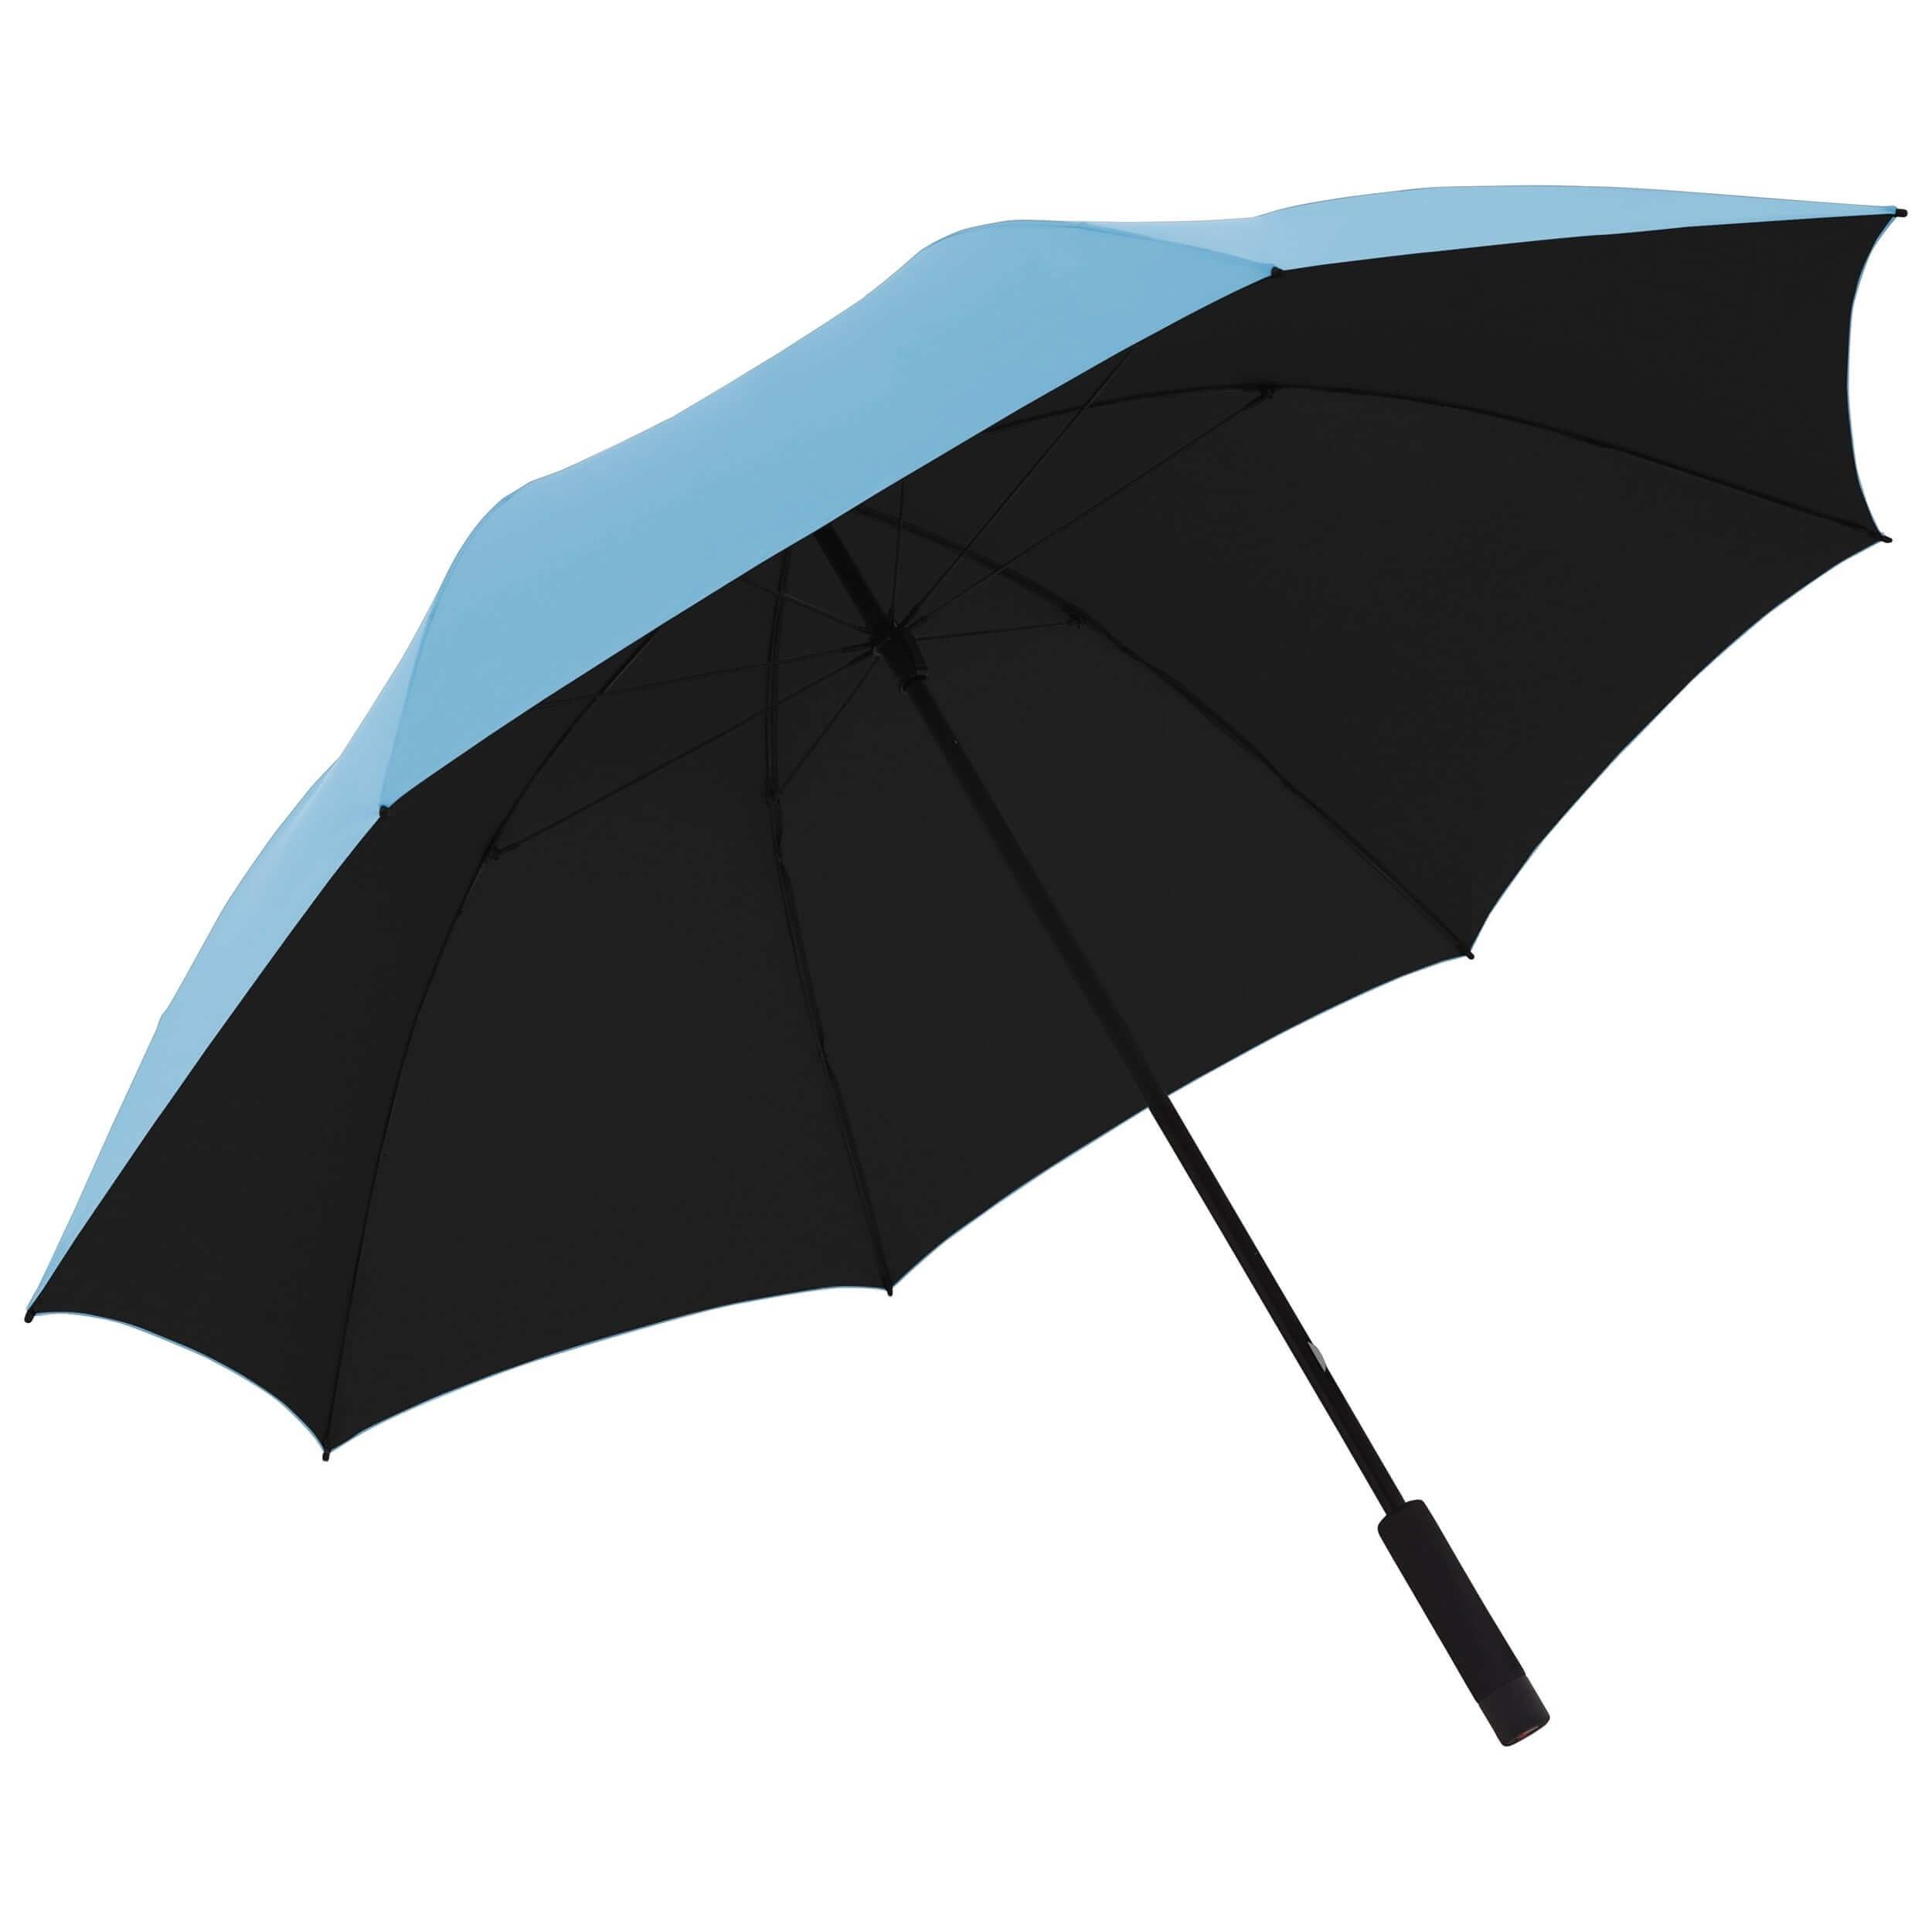 Knirps Stok Paraplu Ultra Light XXL Blue with Black